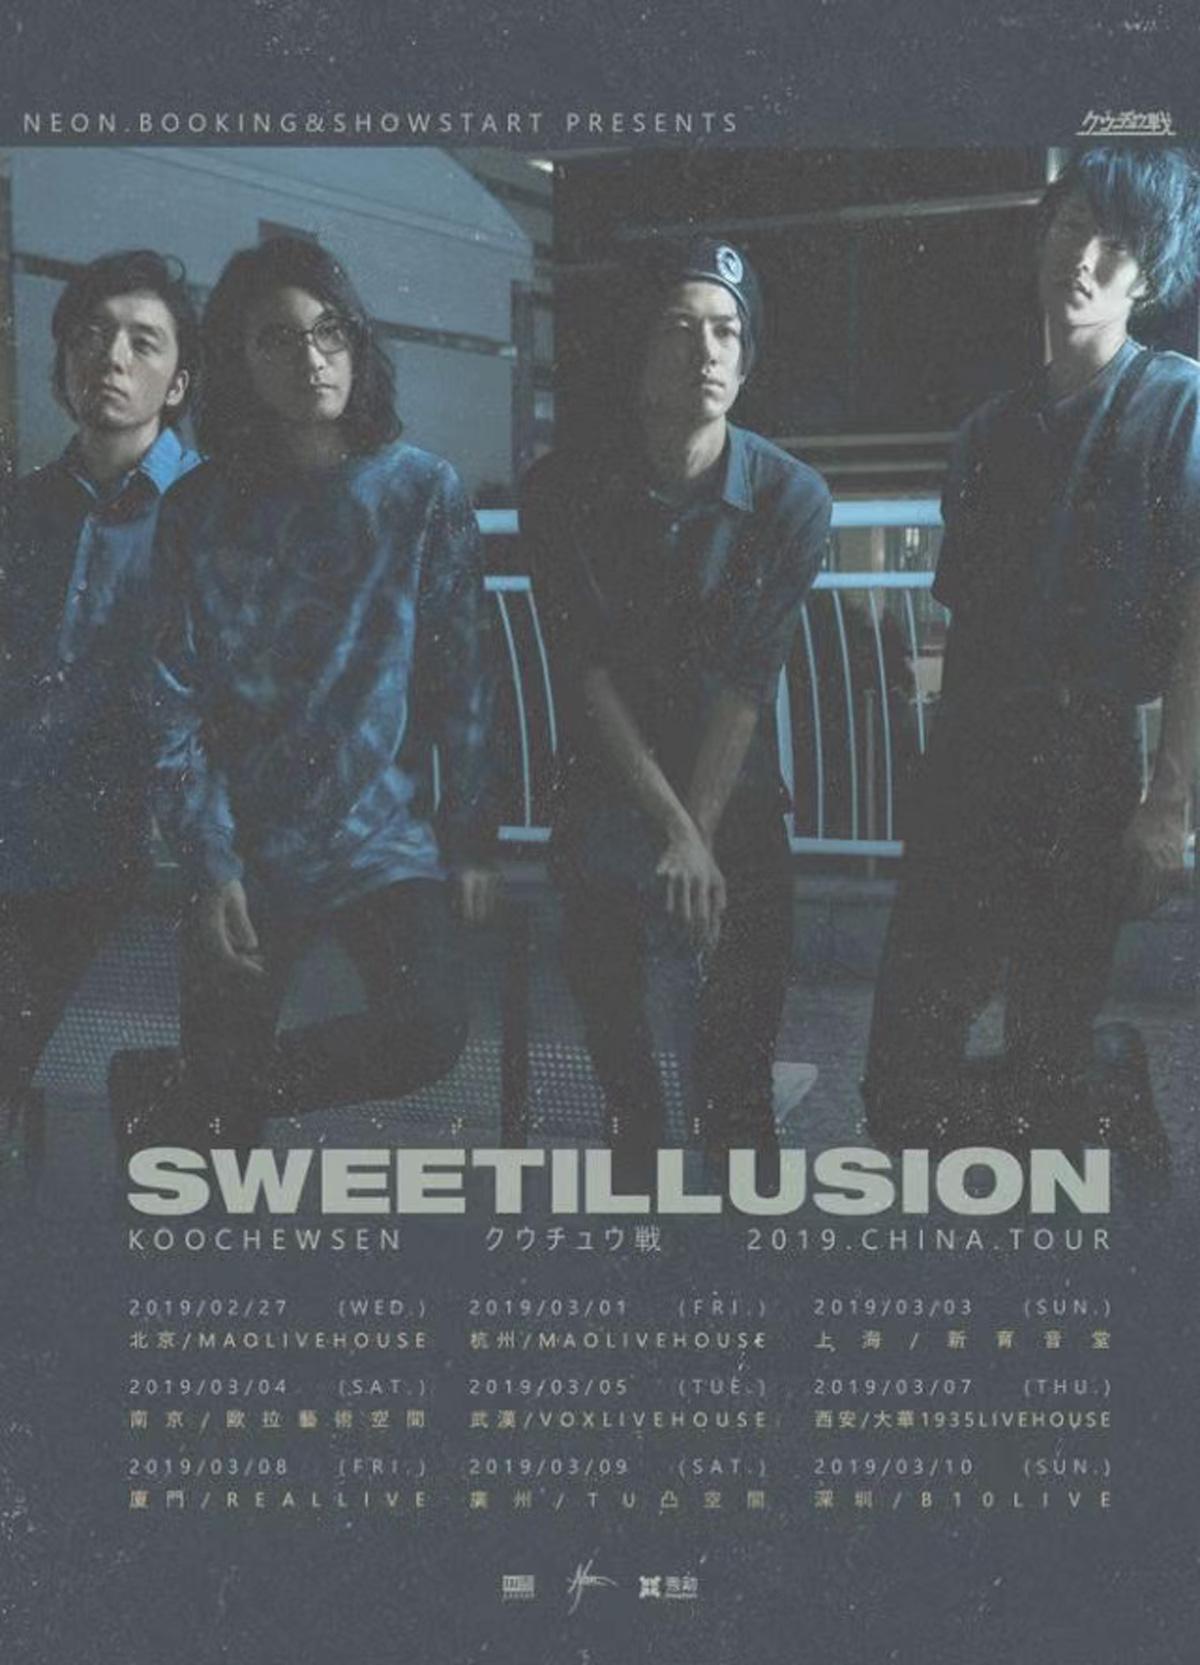 SWEETILLUSION